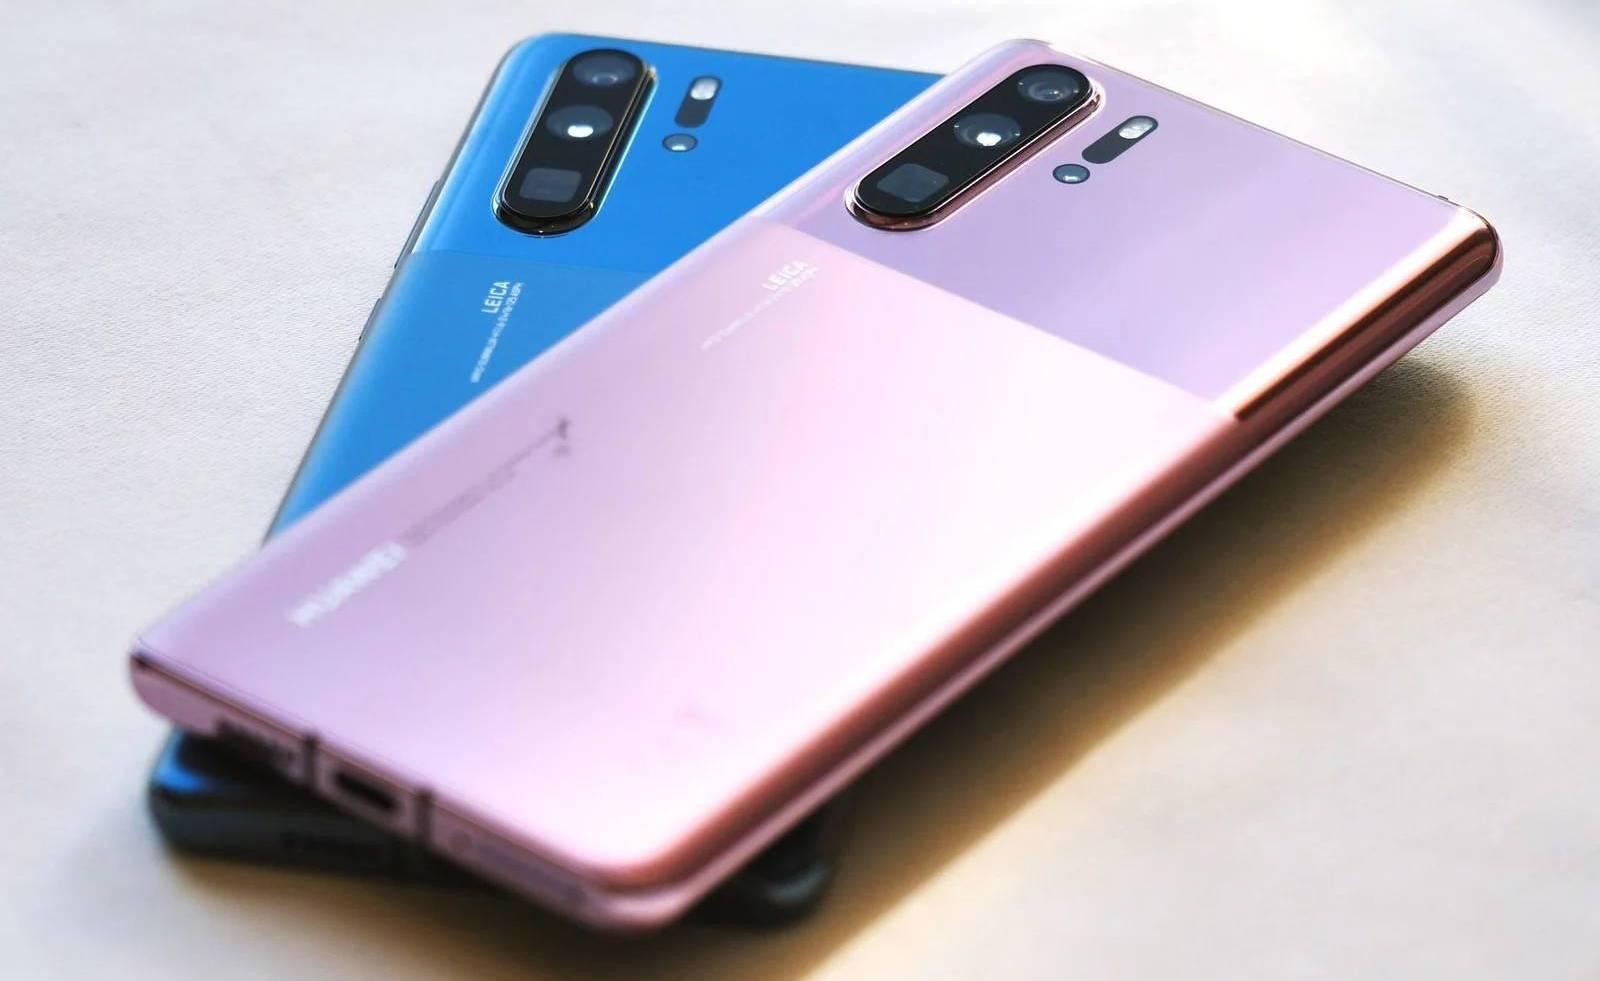 Huawei P30 PRO. OFICIAL, CAND se LANSEAZA Android 10 pe Telefoane